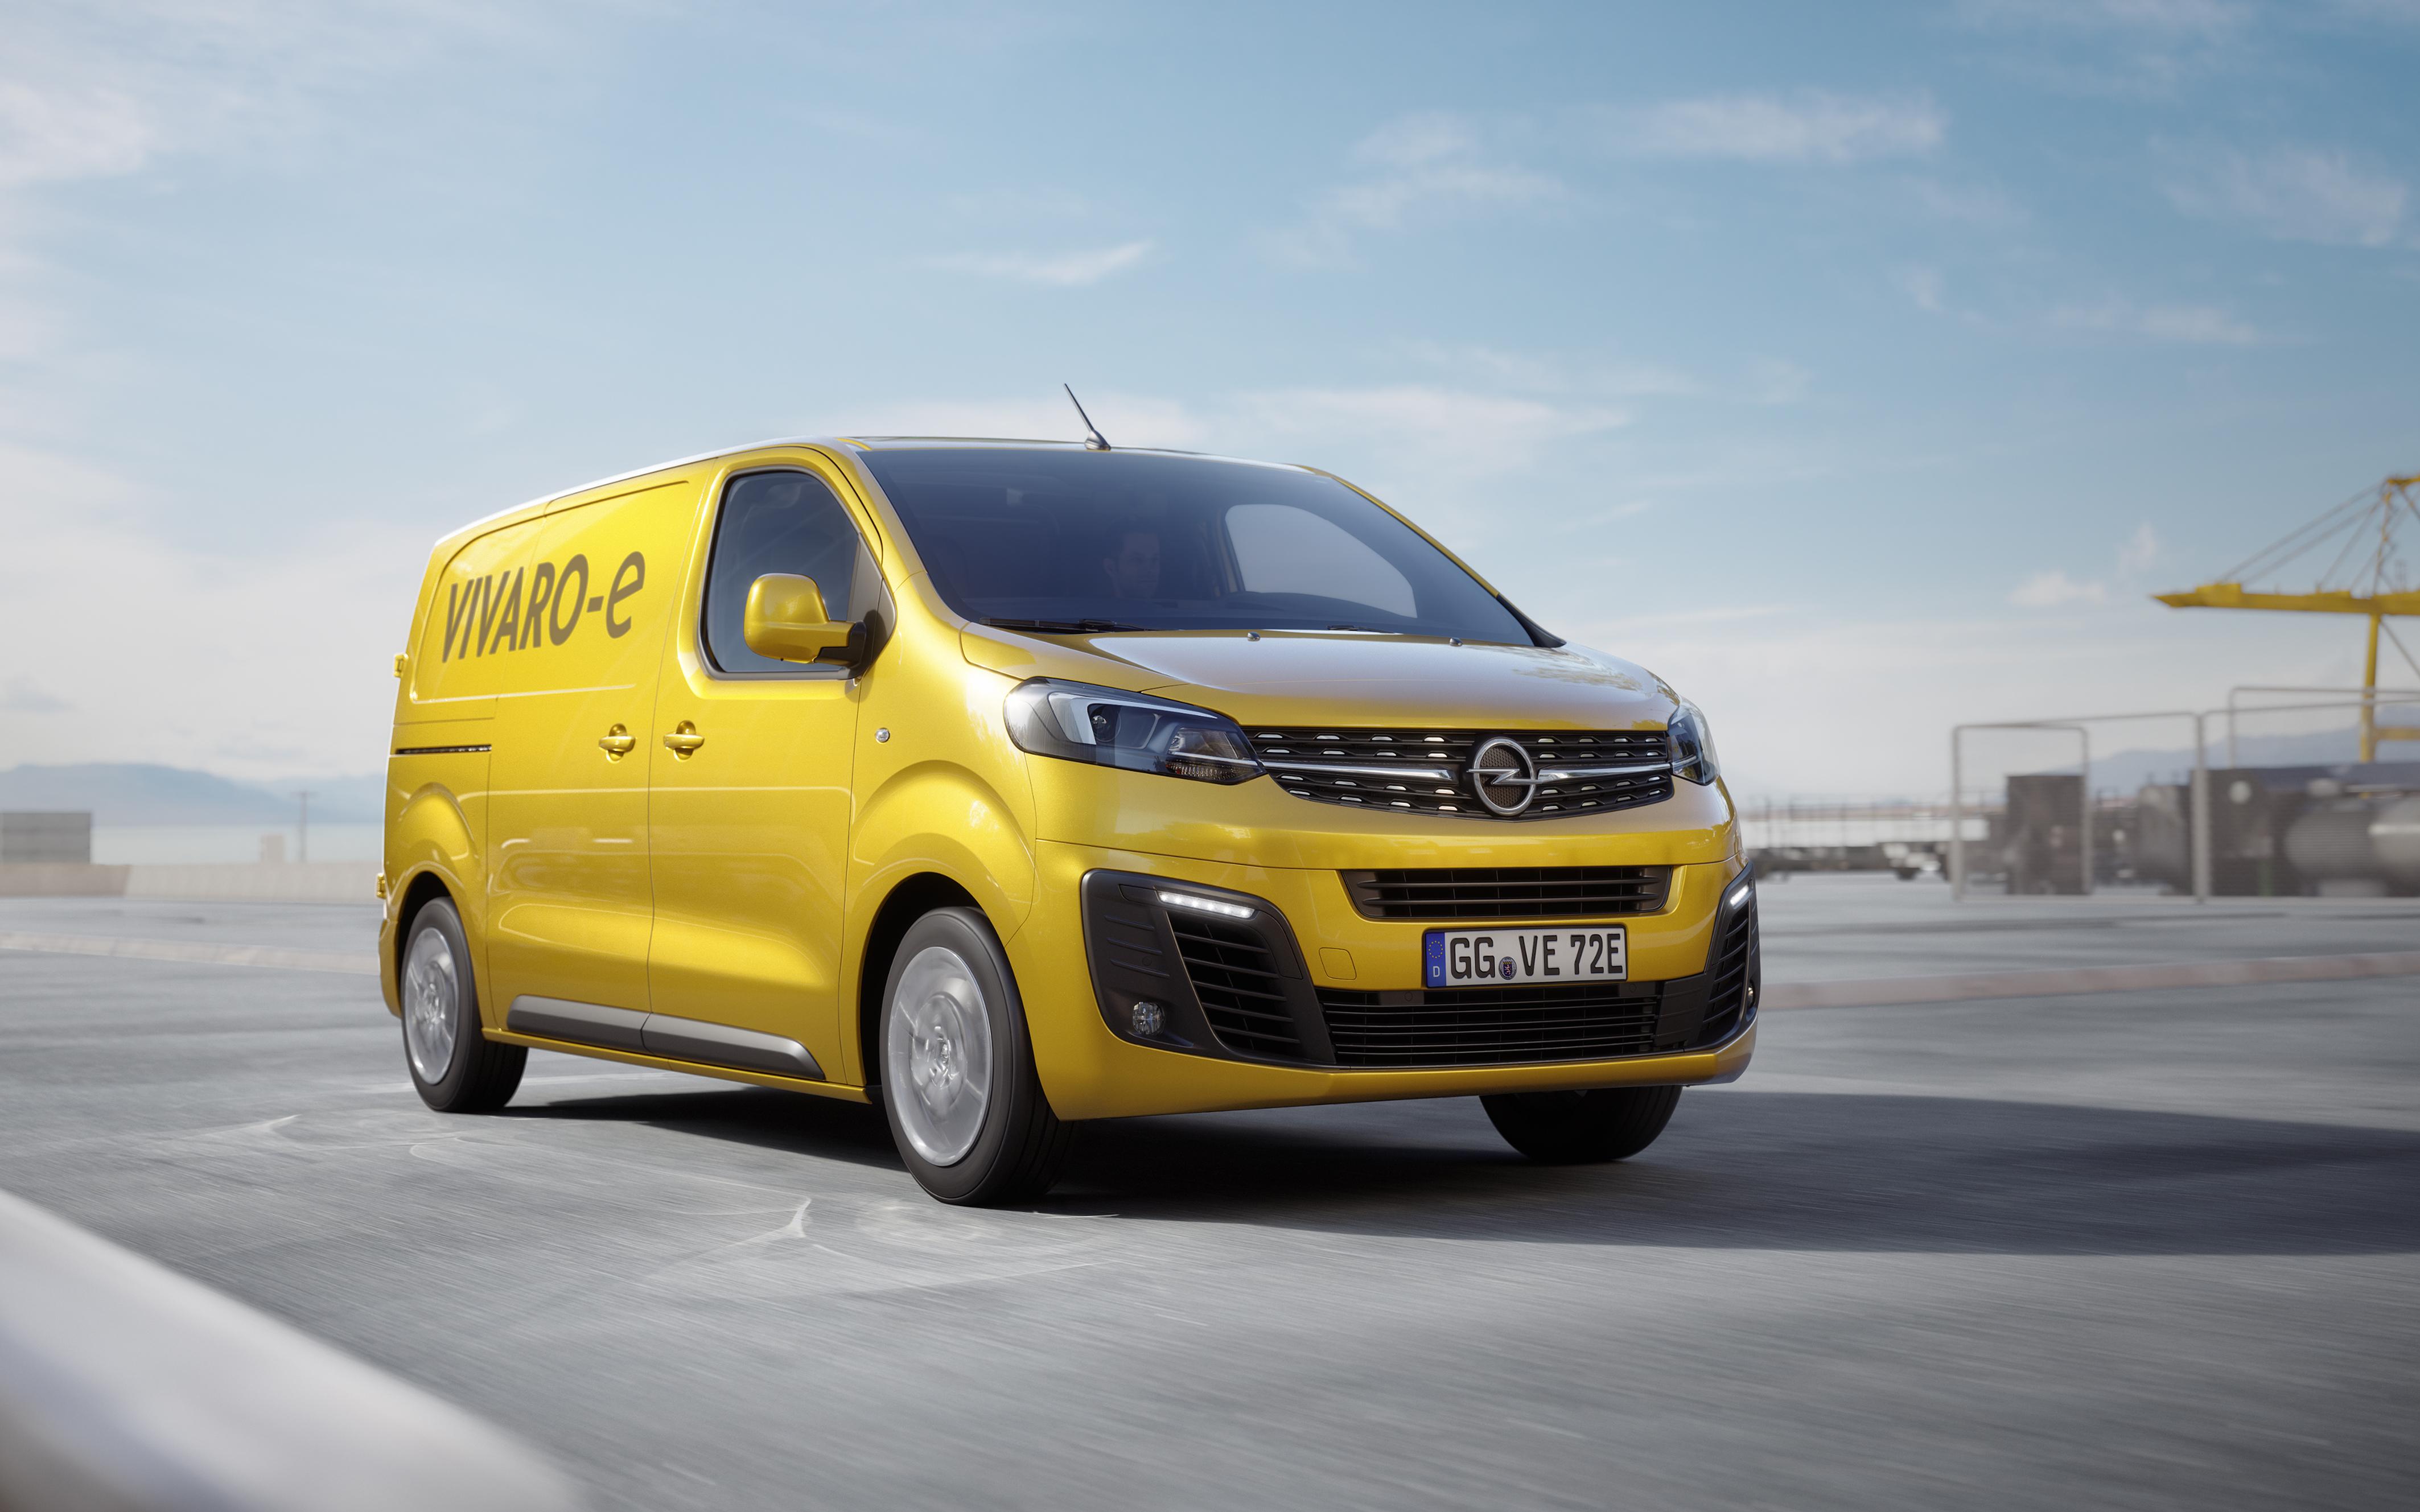 Opel Vivaro-e va fi lansat în 2020